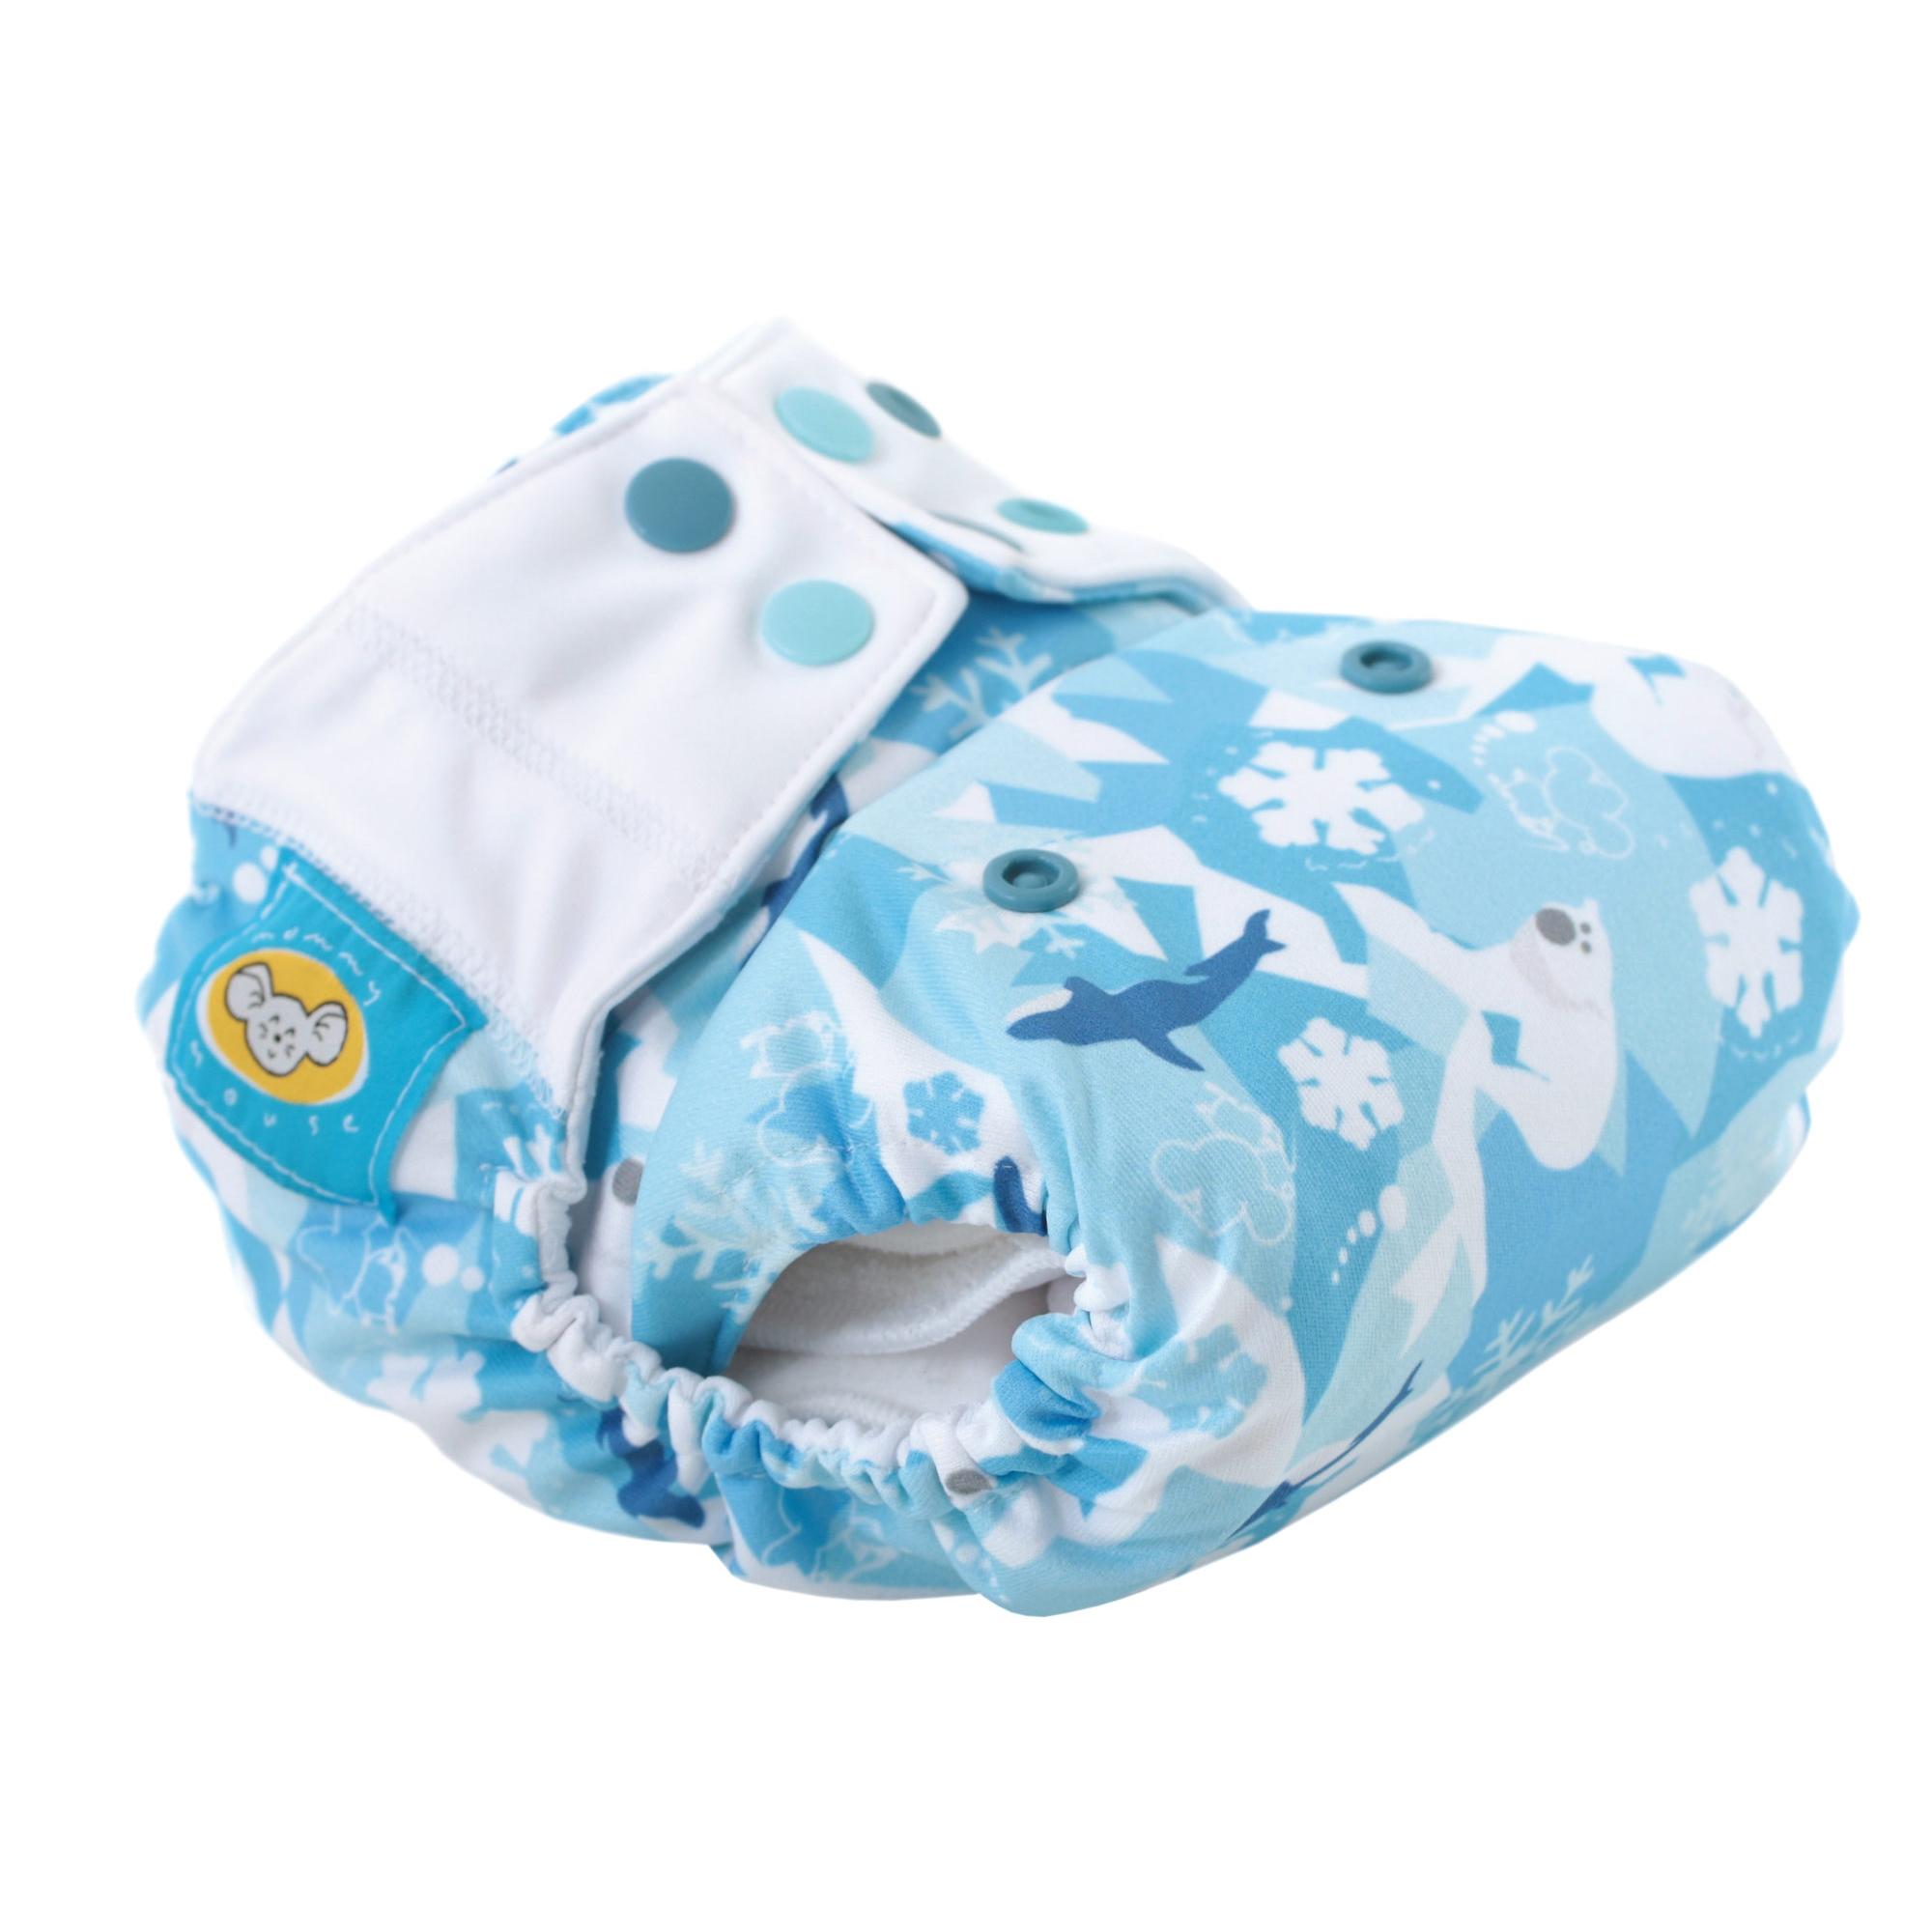 ARCTOS-sperrelag-xl-9-19kg-mommy-mouse